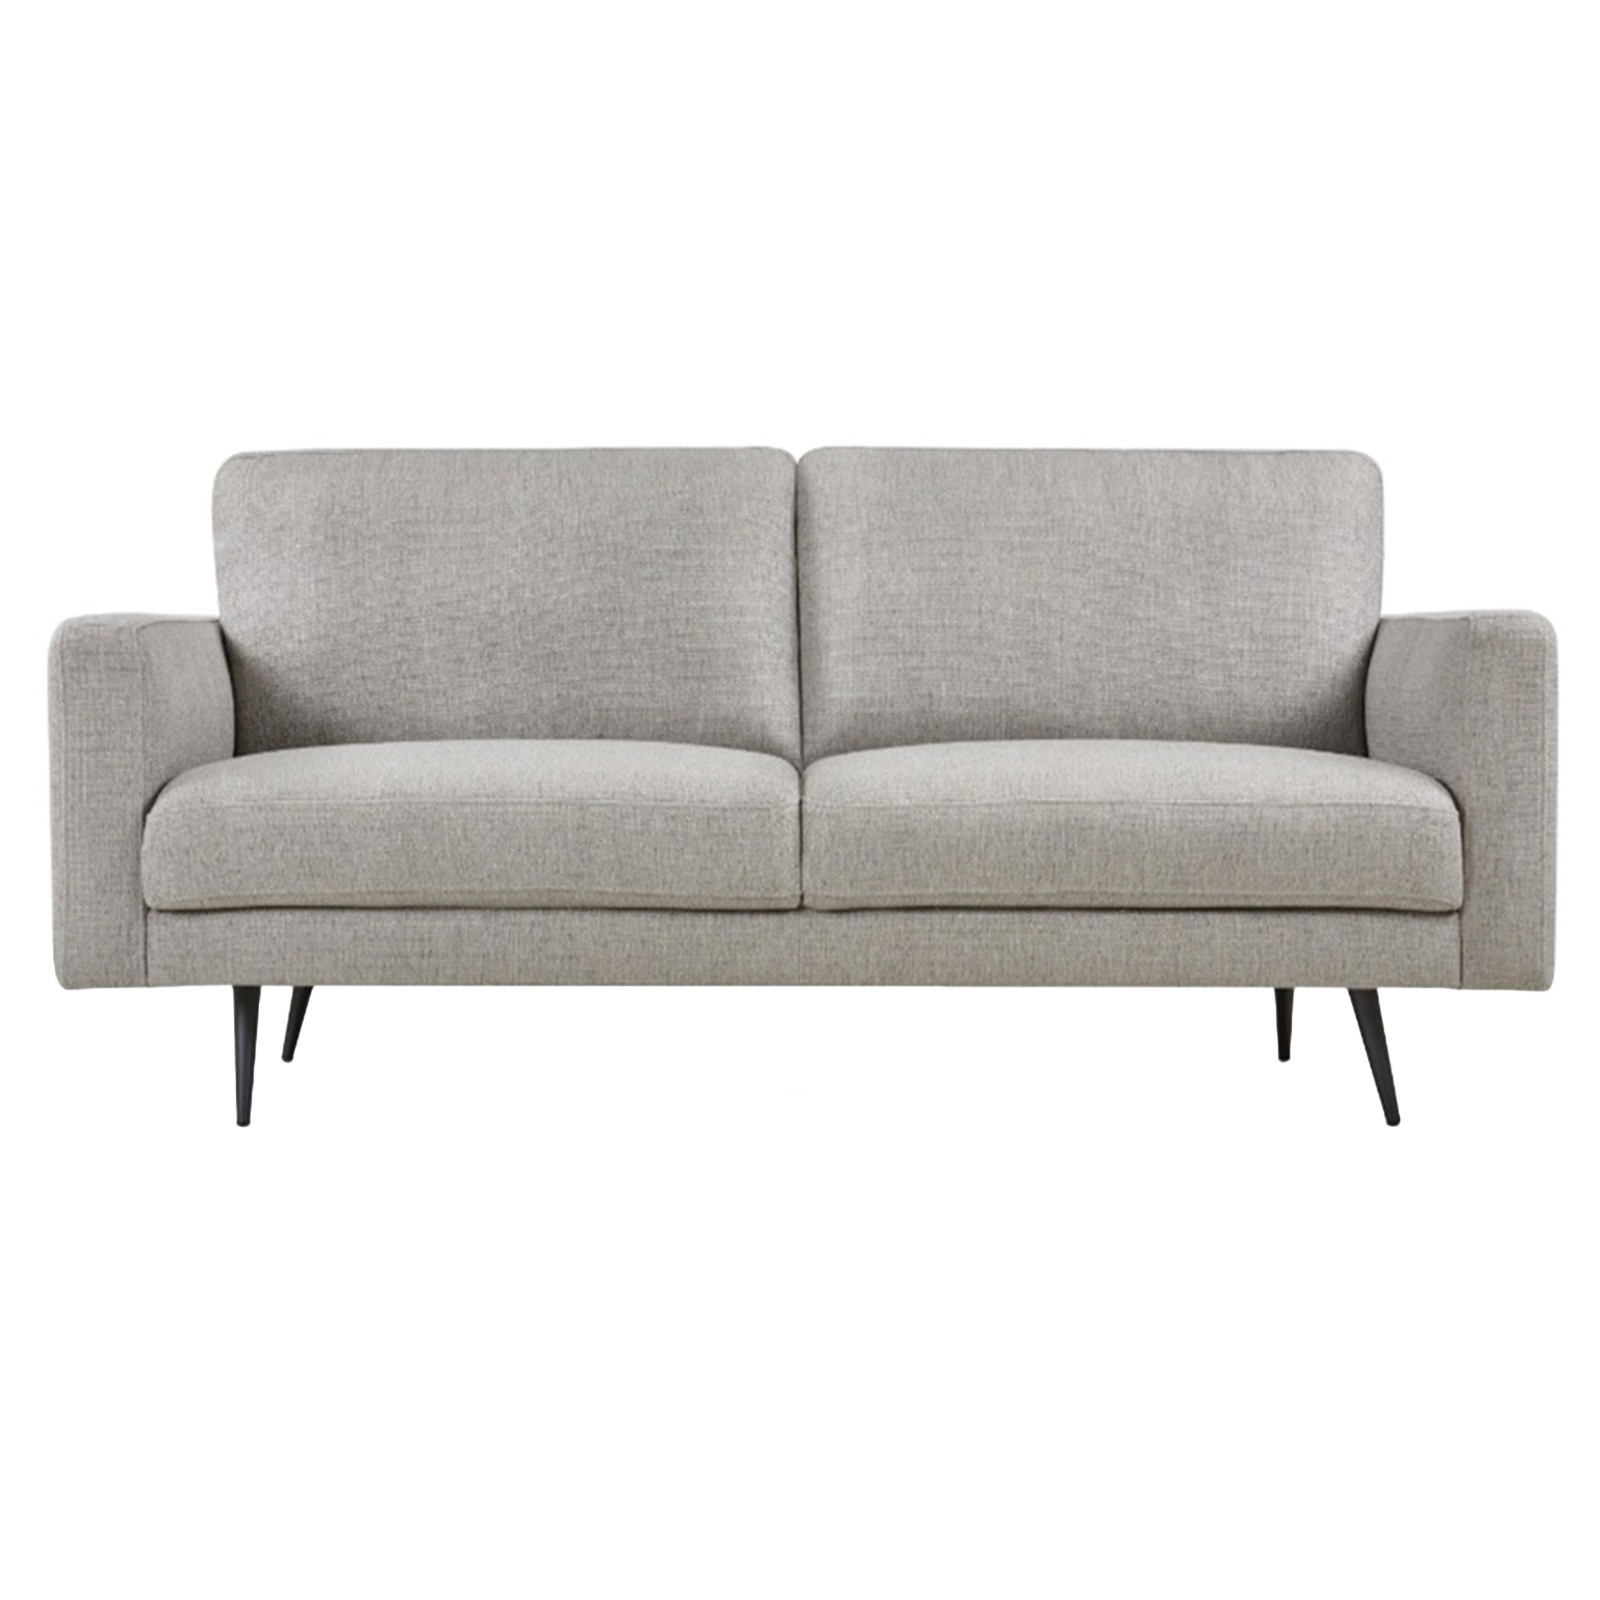 Mariane Fabric Sofa, 2 Seater